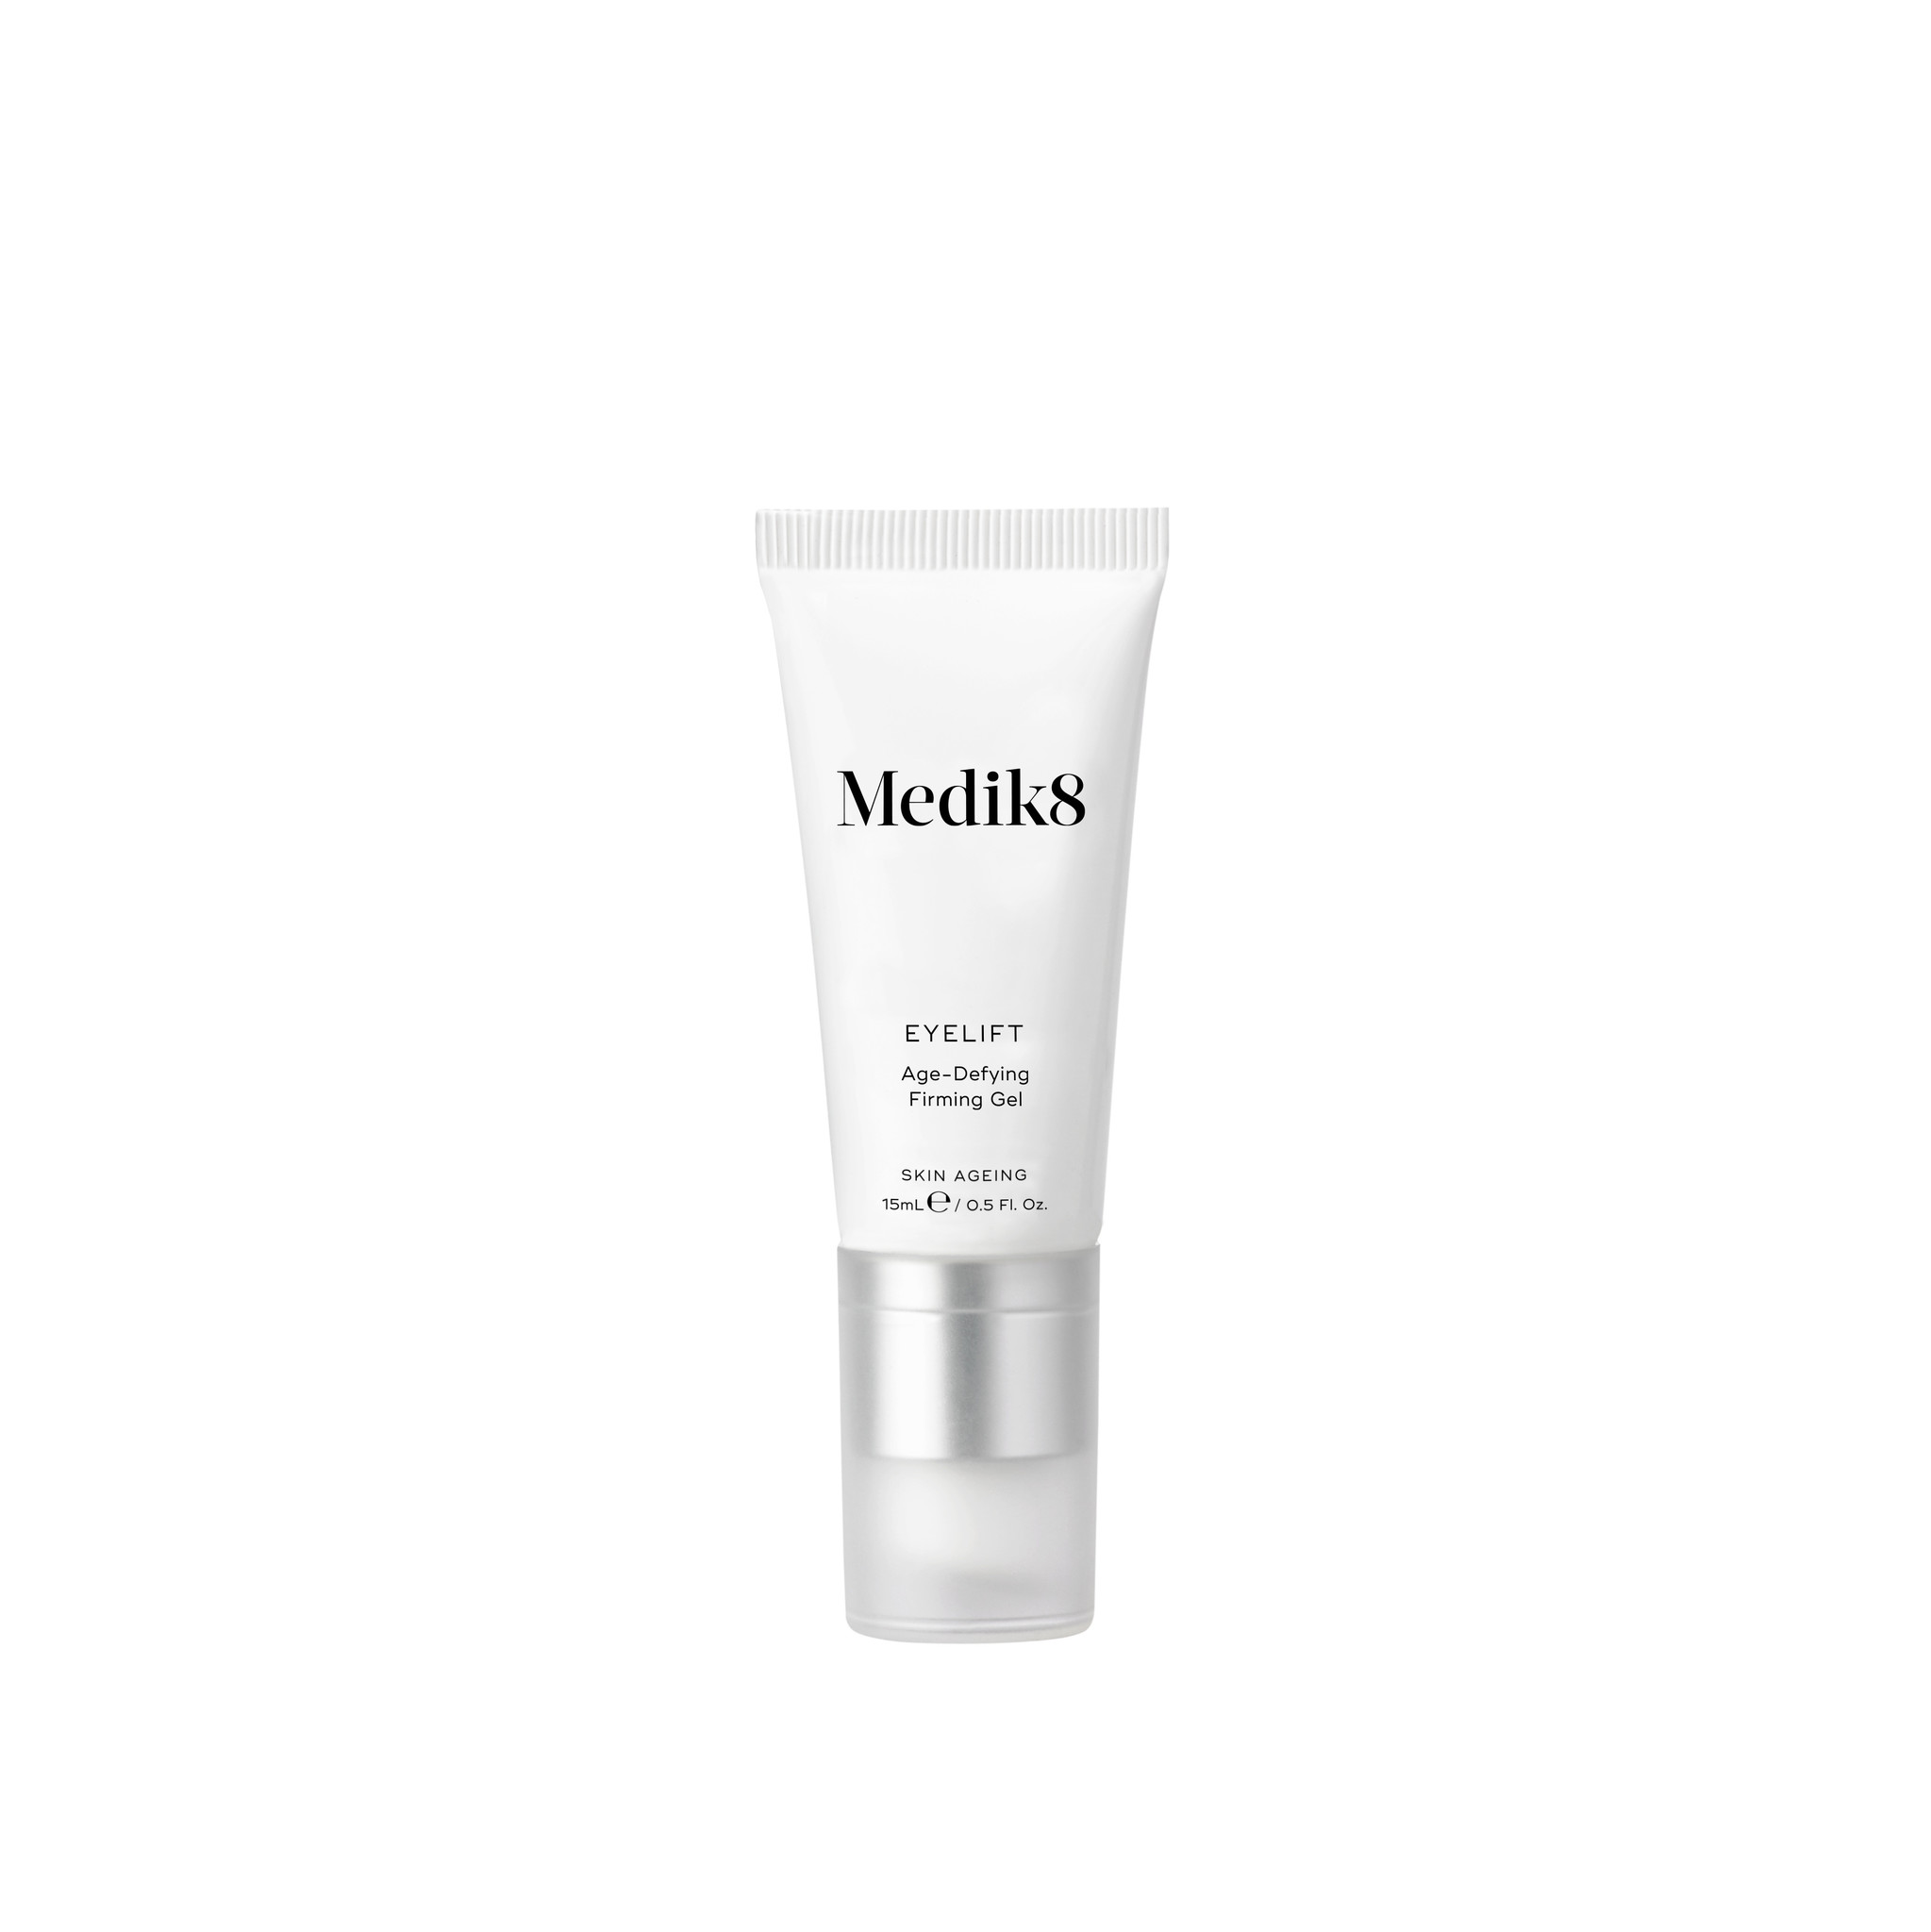 Medik8 Eyelift Peptides | Age-Defying Firming Gel | 15ml